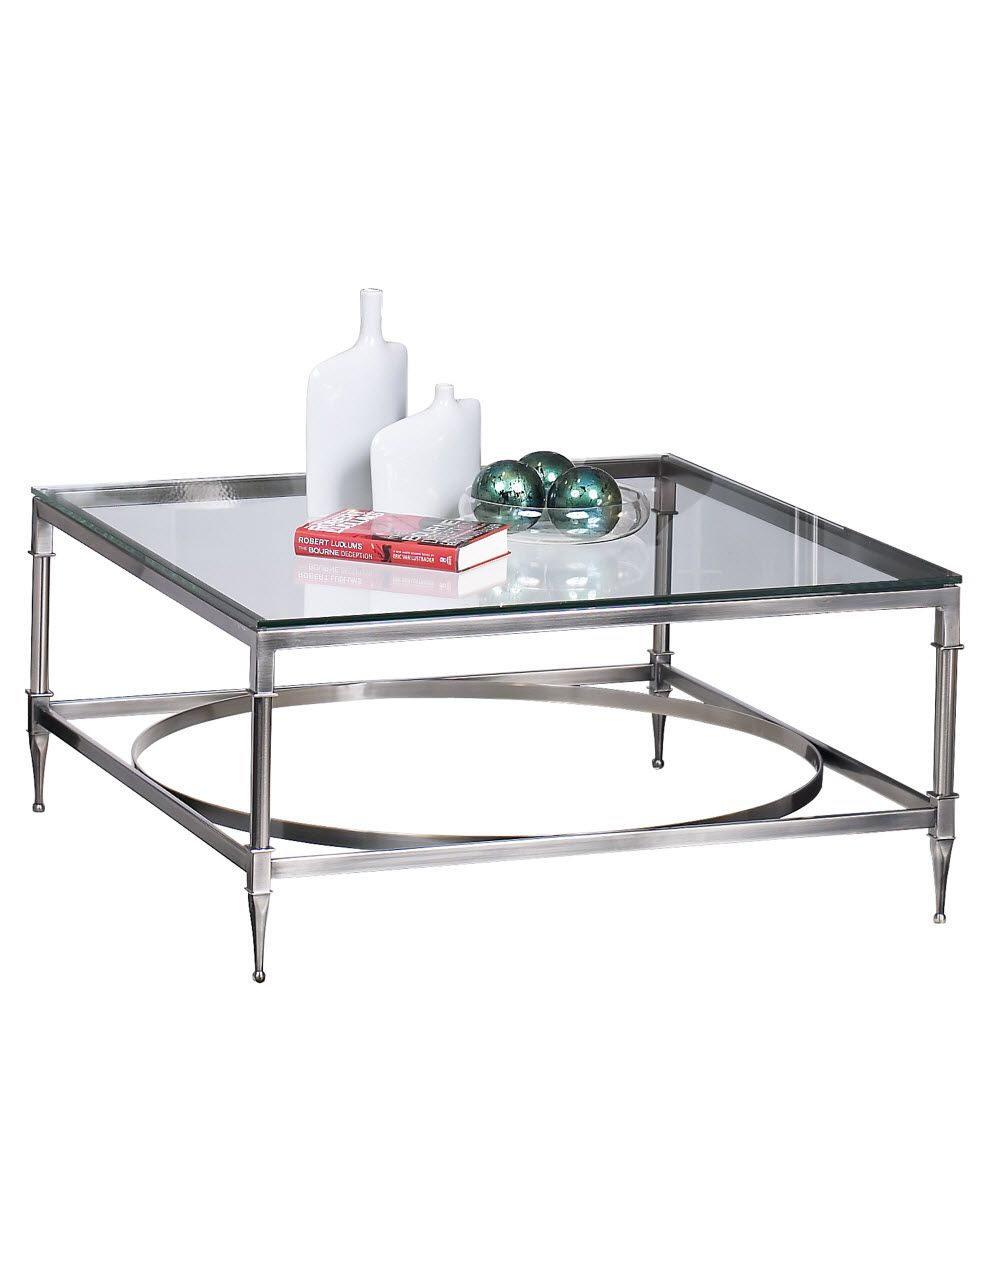 Furniture Of America Rizza High Gloss Coffee Table Coffee Table Round Glass Coffee Table Glass Coffee Table [ 1092 x 1770 Pixel ]